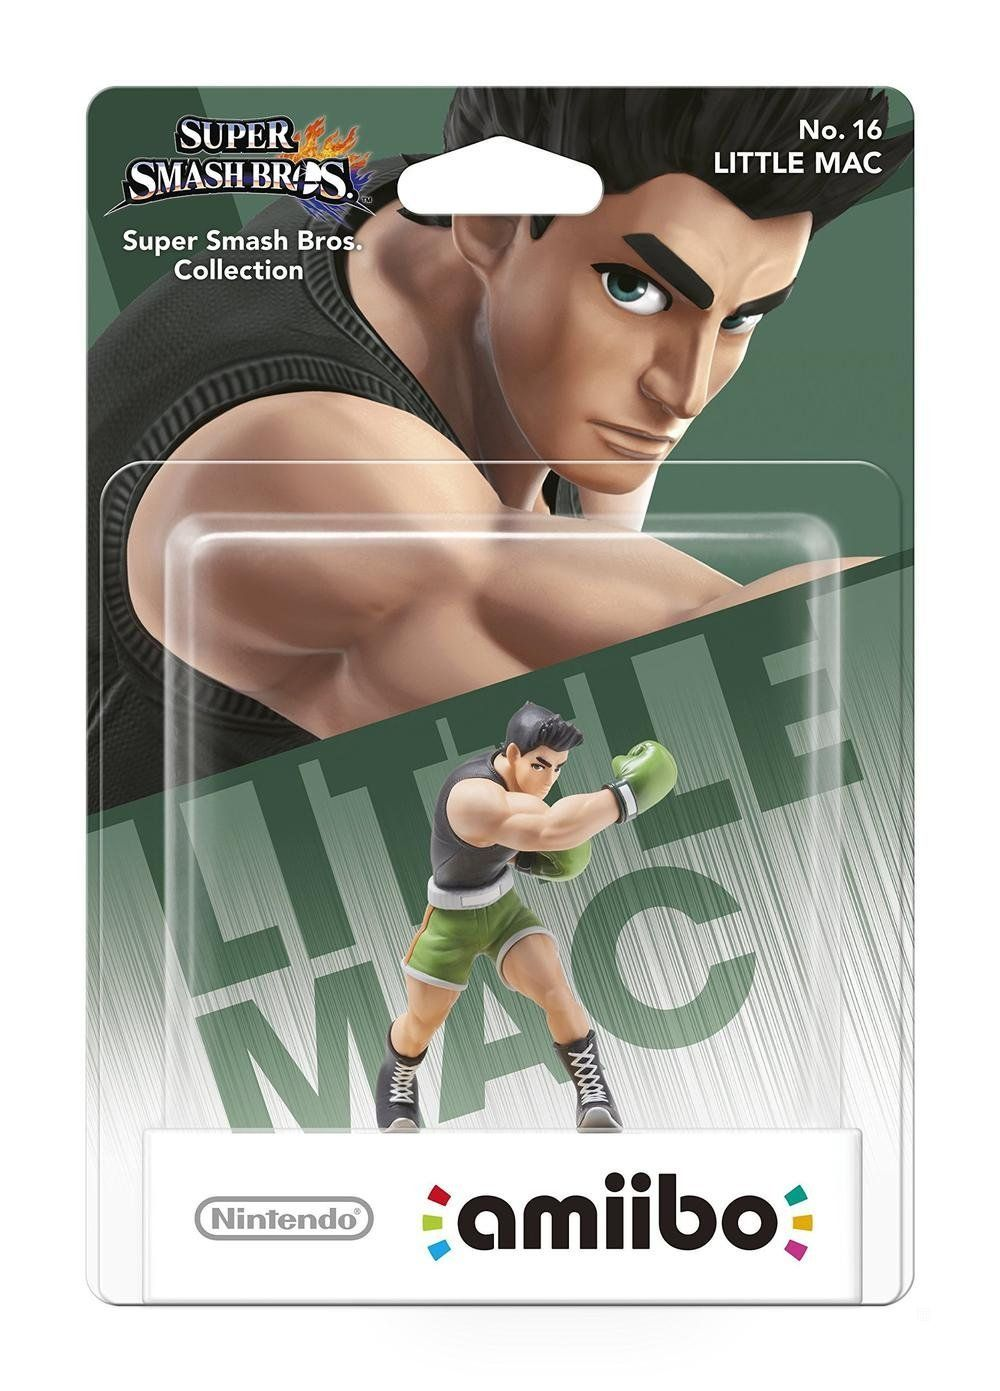 Nintendo amiibo Super Smash Bros. - Little Mac (Nintendo Wii U/3DS): Amazon.co.uk: PC & Video Games